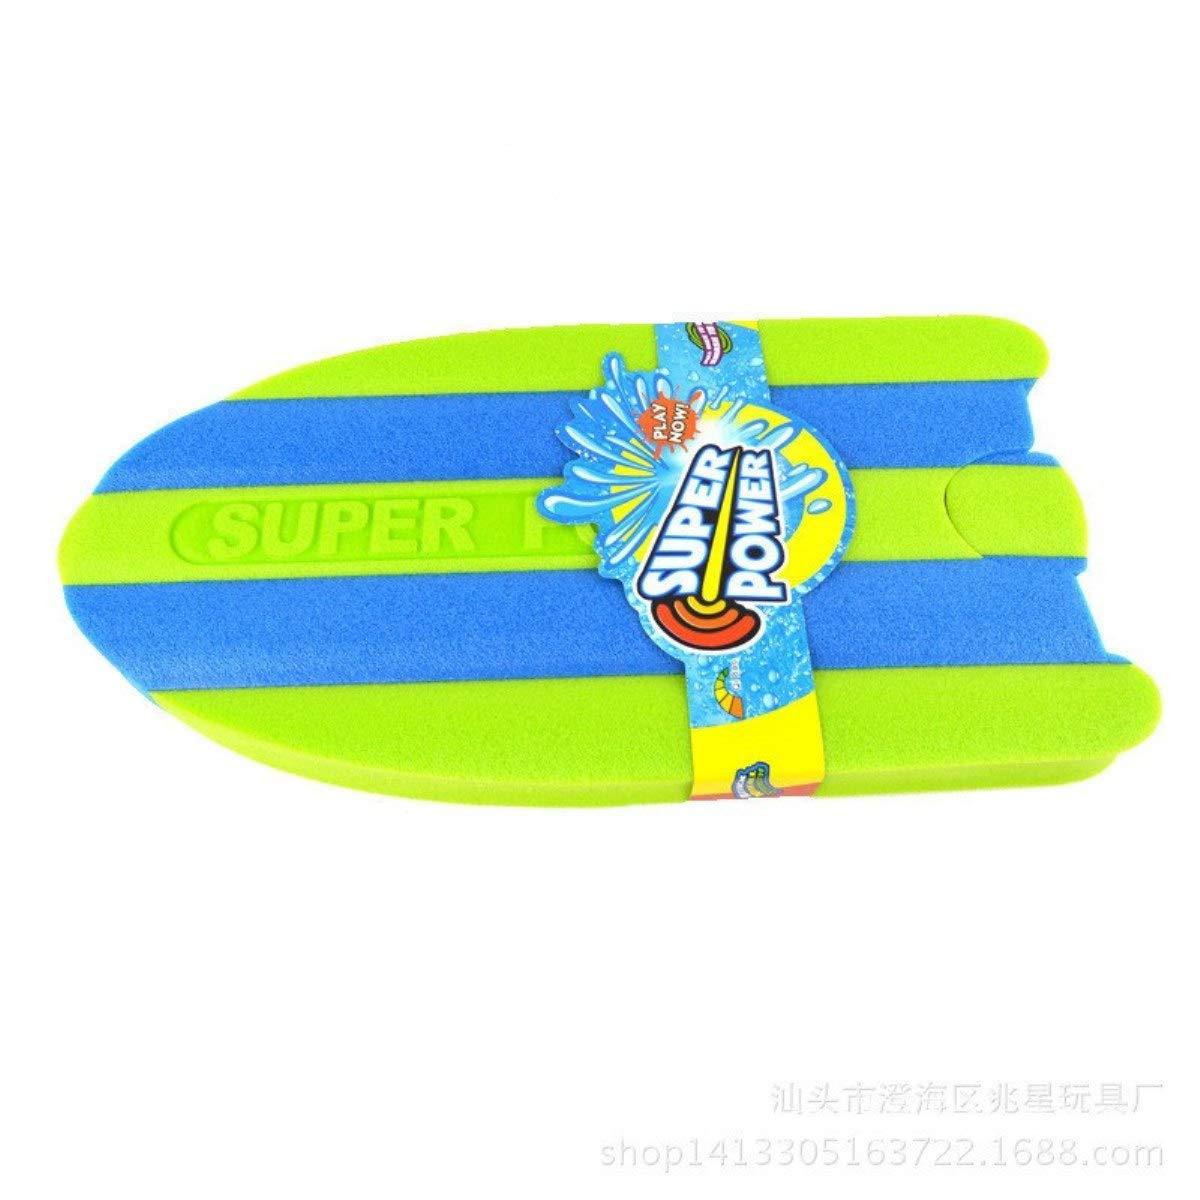 5billion Summer Water Gun Toys Swimming Kickboard Water Pistol Toys Swimming Pool Water Gun Toys for Children